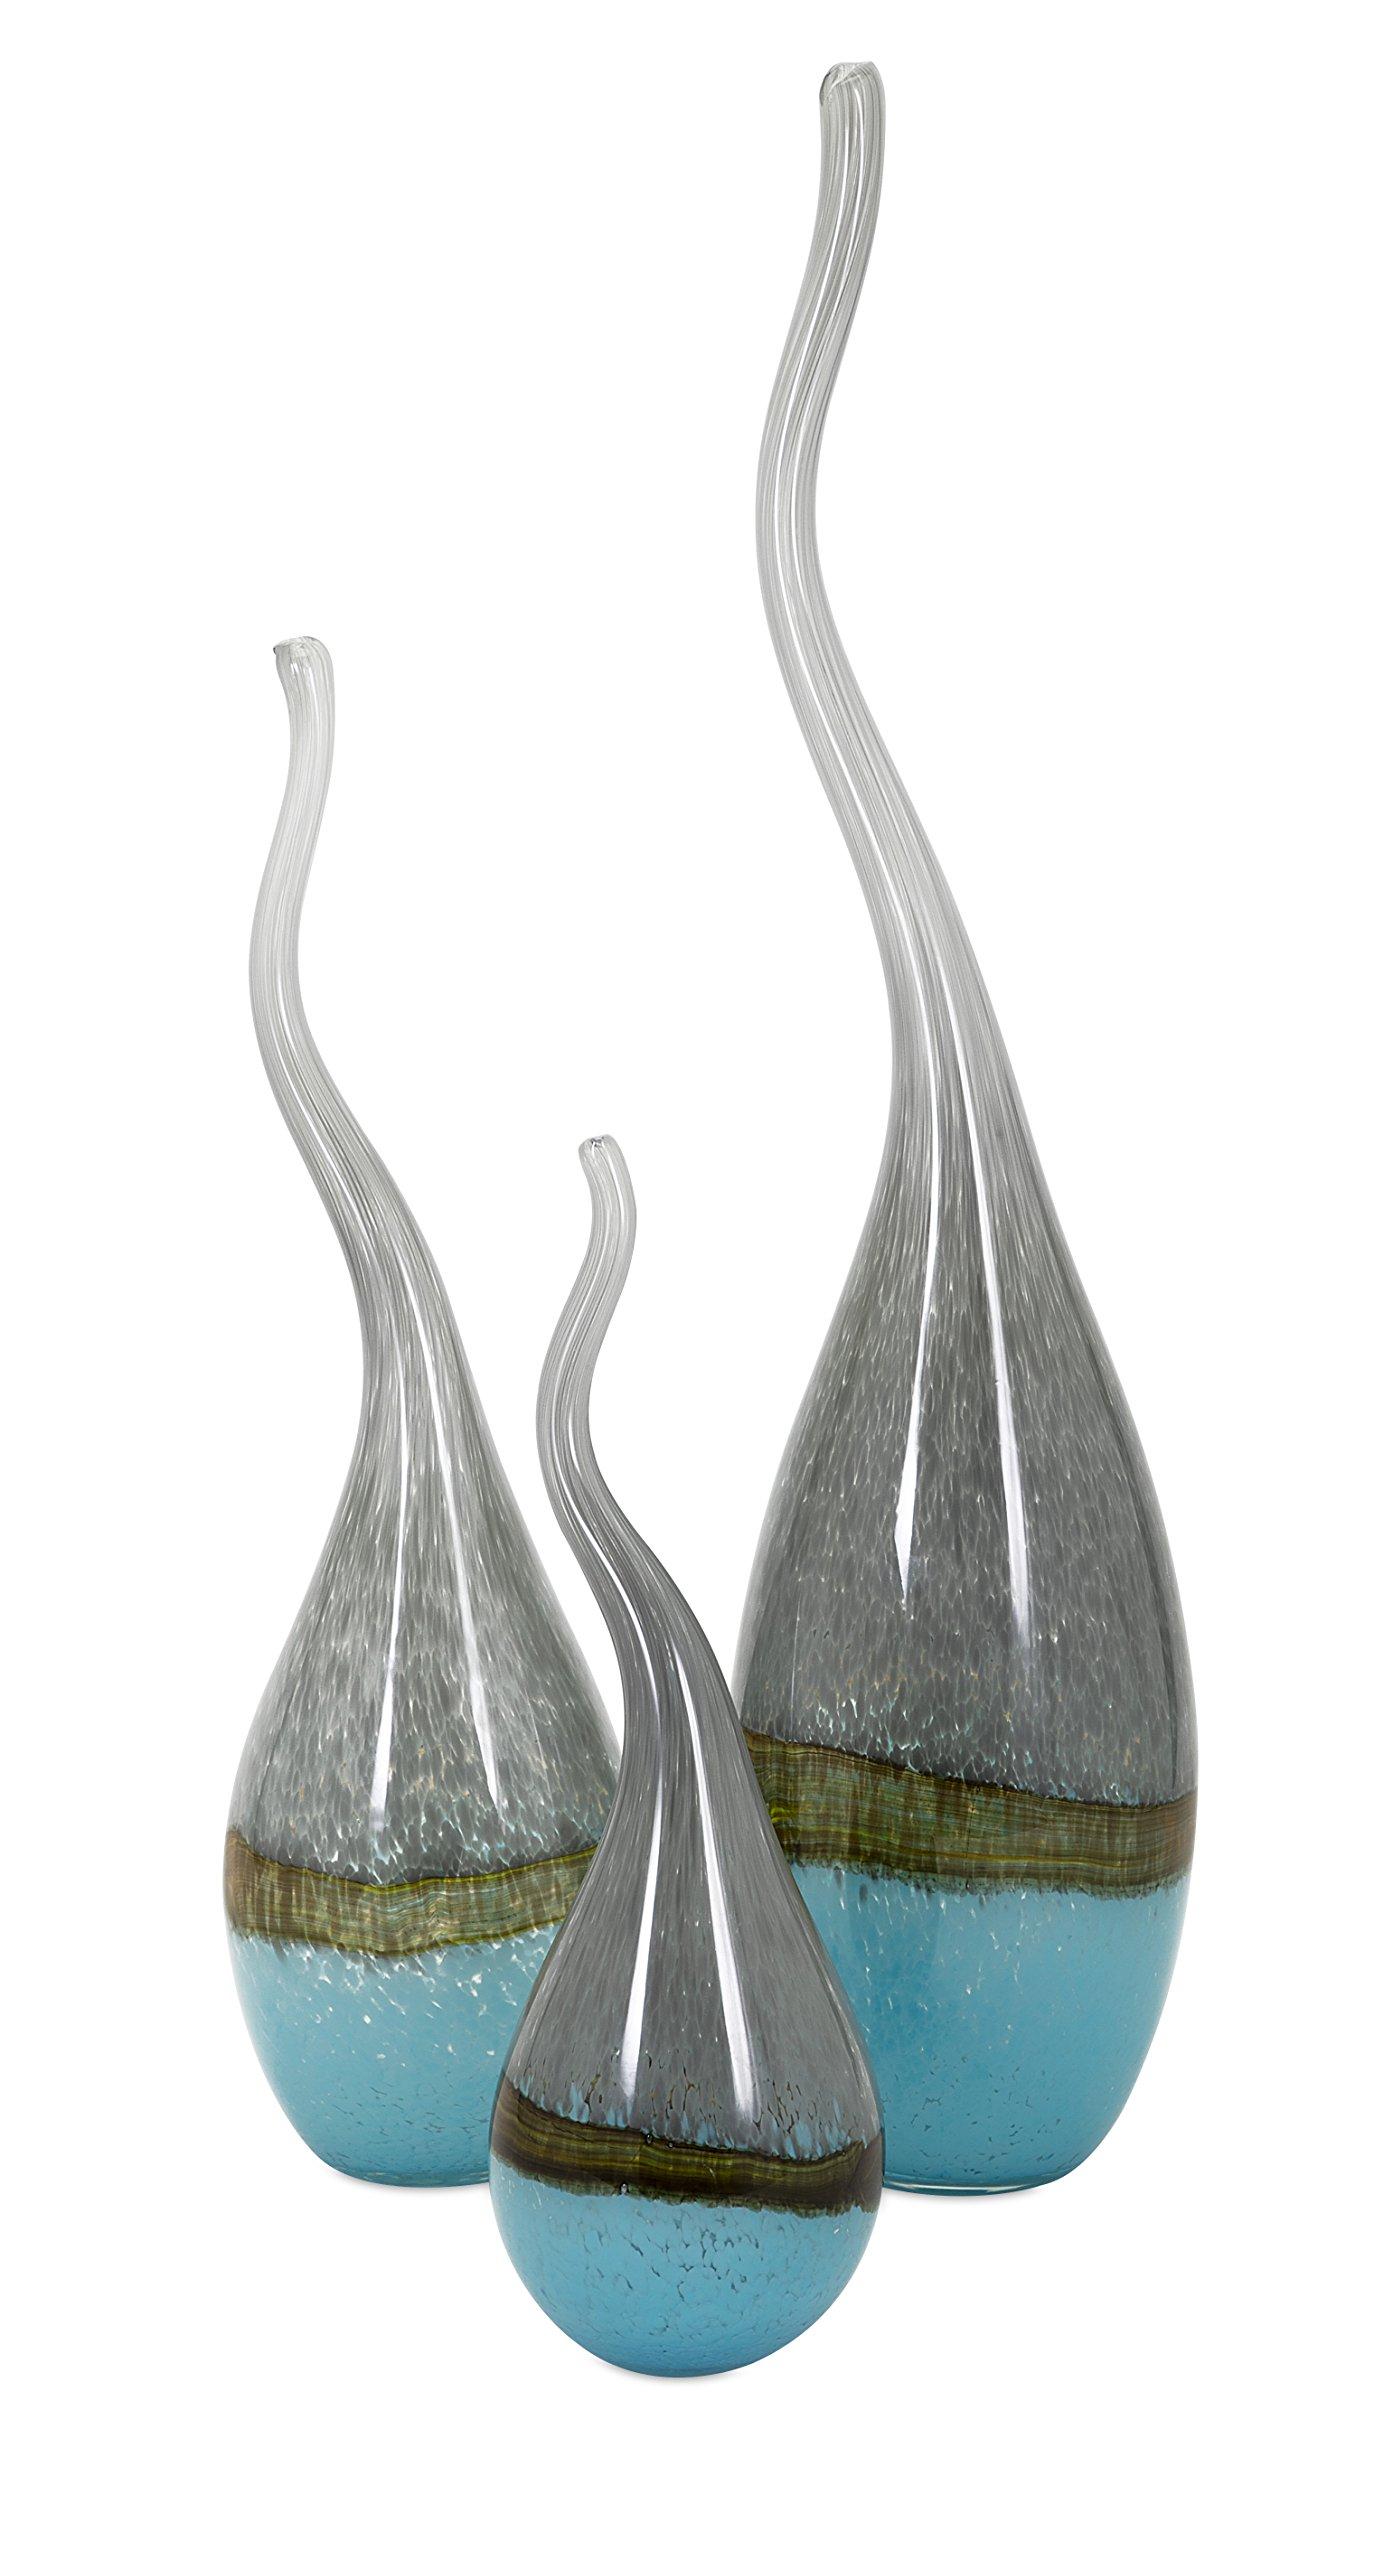 IMAX 47948-3 Squiggle Glass Vases - Set of Three